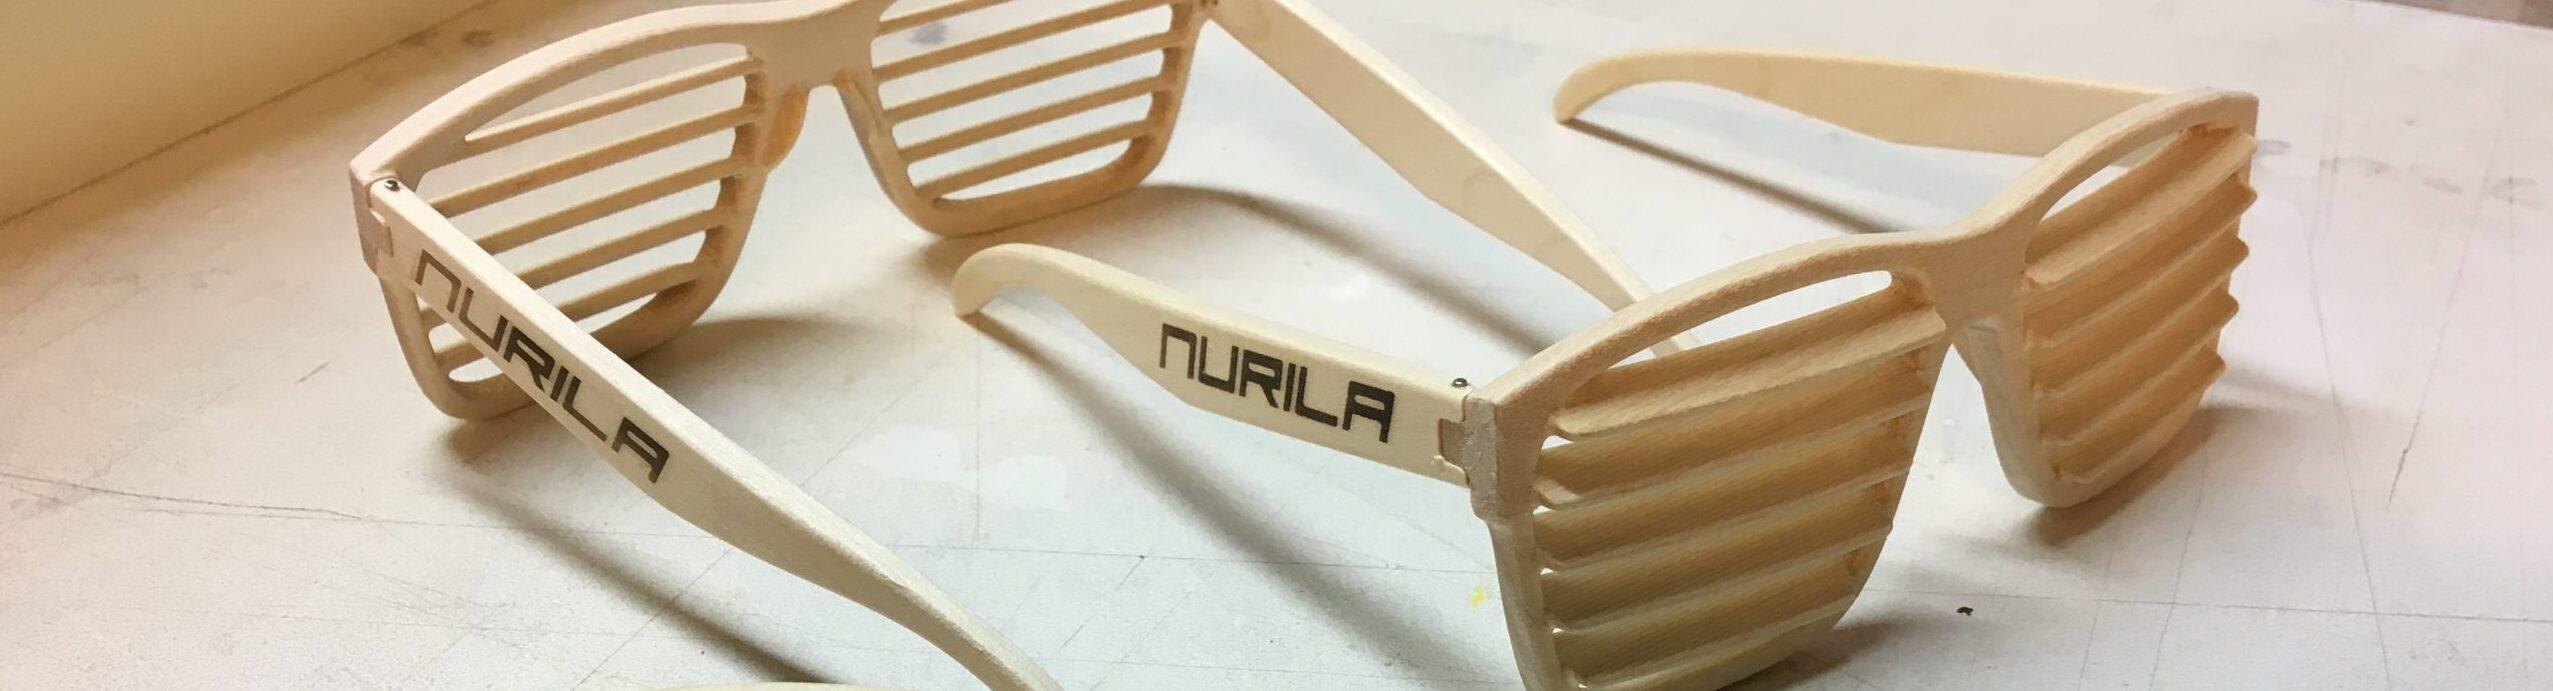 Nurila